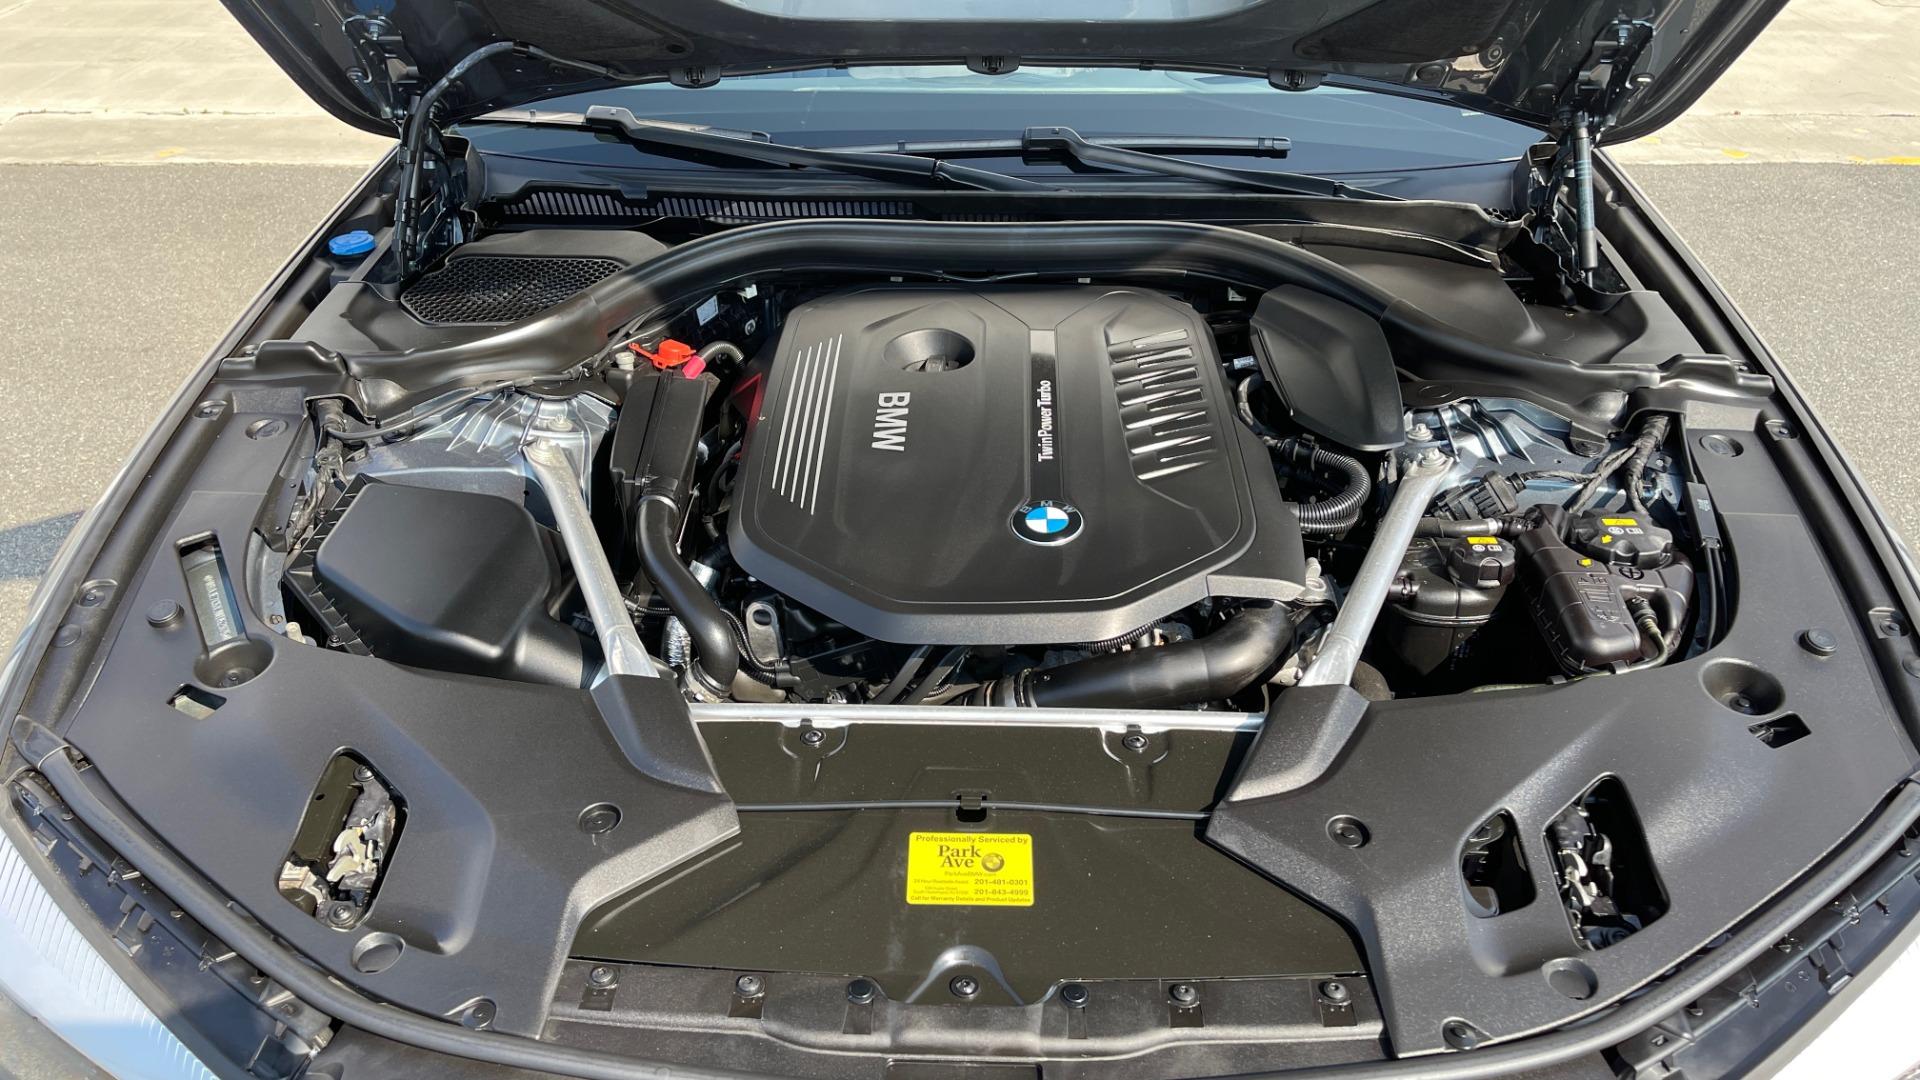 Used 2018 BMW 5 SERIES 540I XDRIVE M-SPORT / DRVR ASST / PDC / APPLE / HUD / H/K SND for sale $42,795 at Formula Imports in Charlotte NC 28227 8